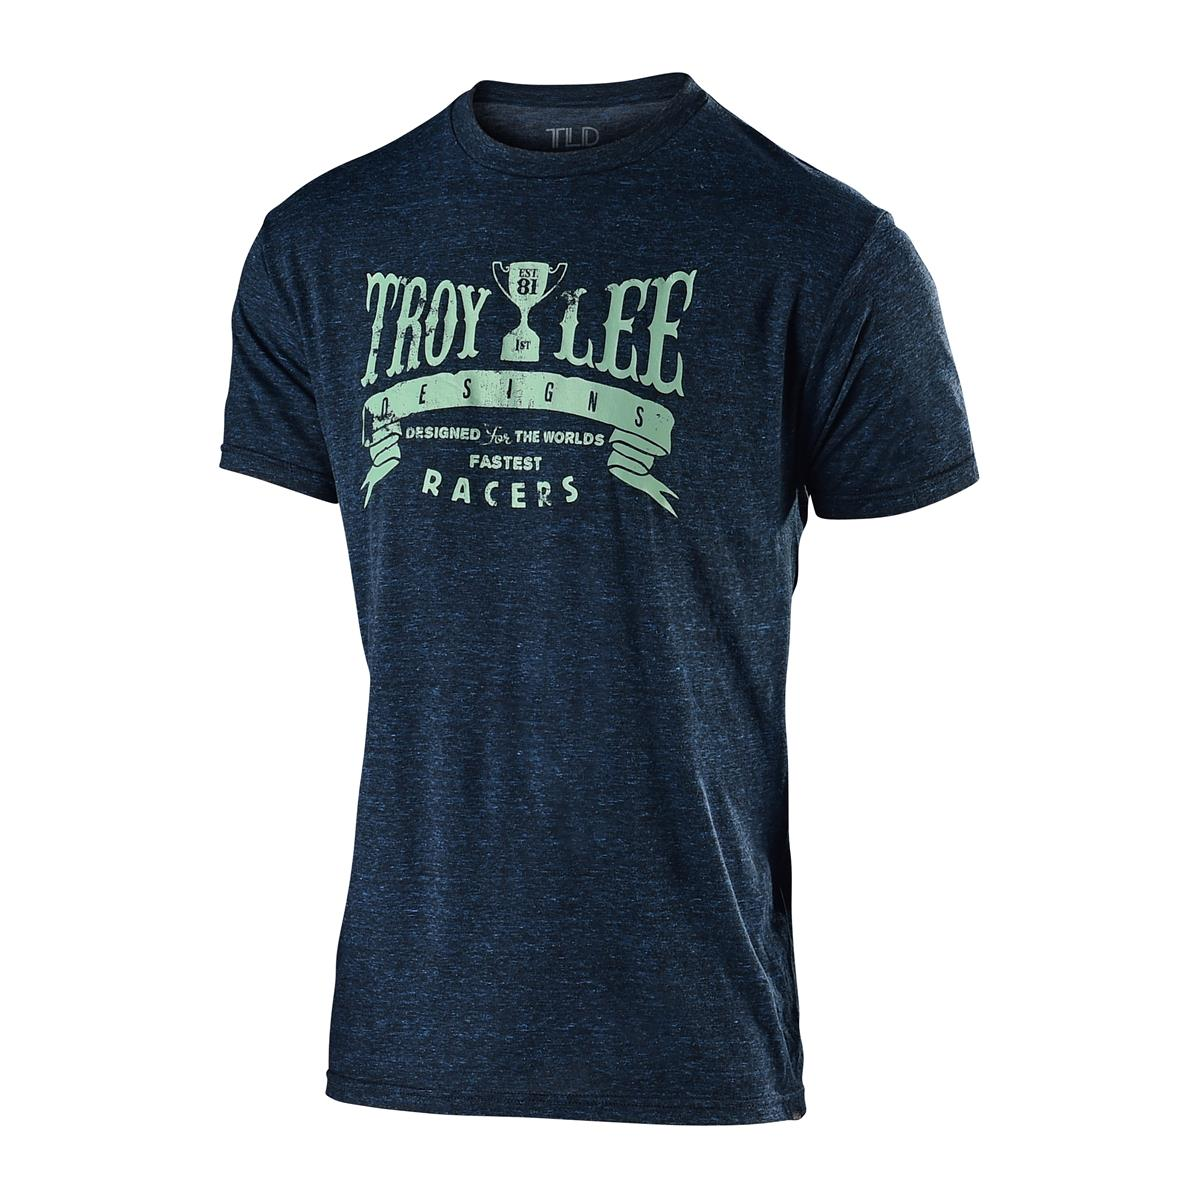 Troy Lee Designs T-Shirt Trophy Racers Midnight Blau